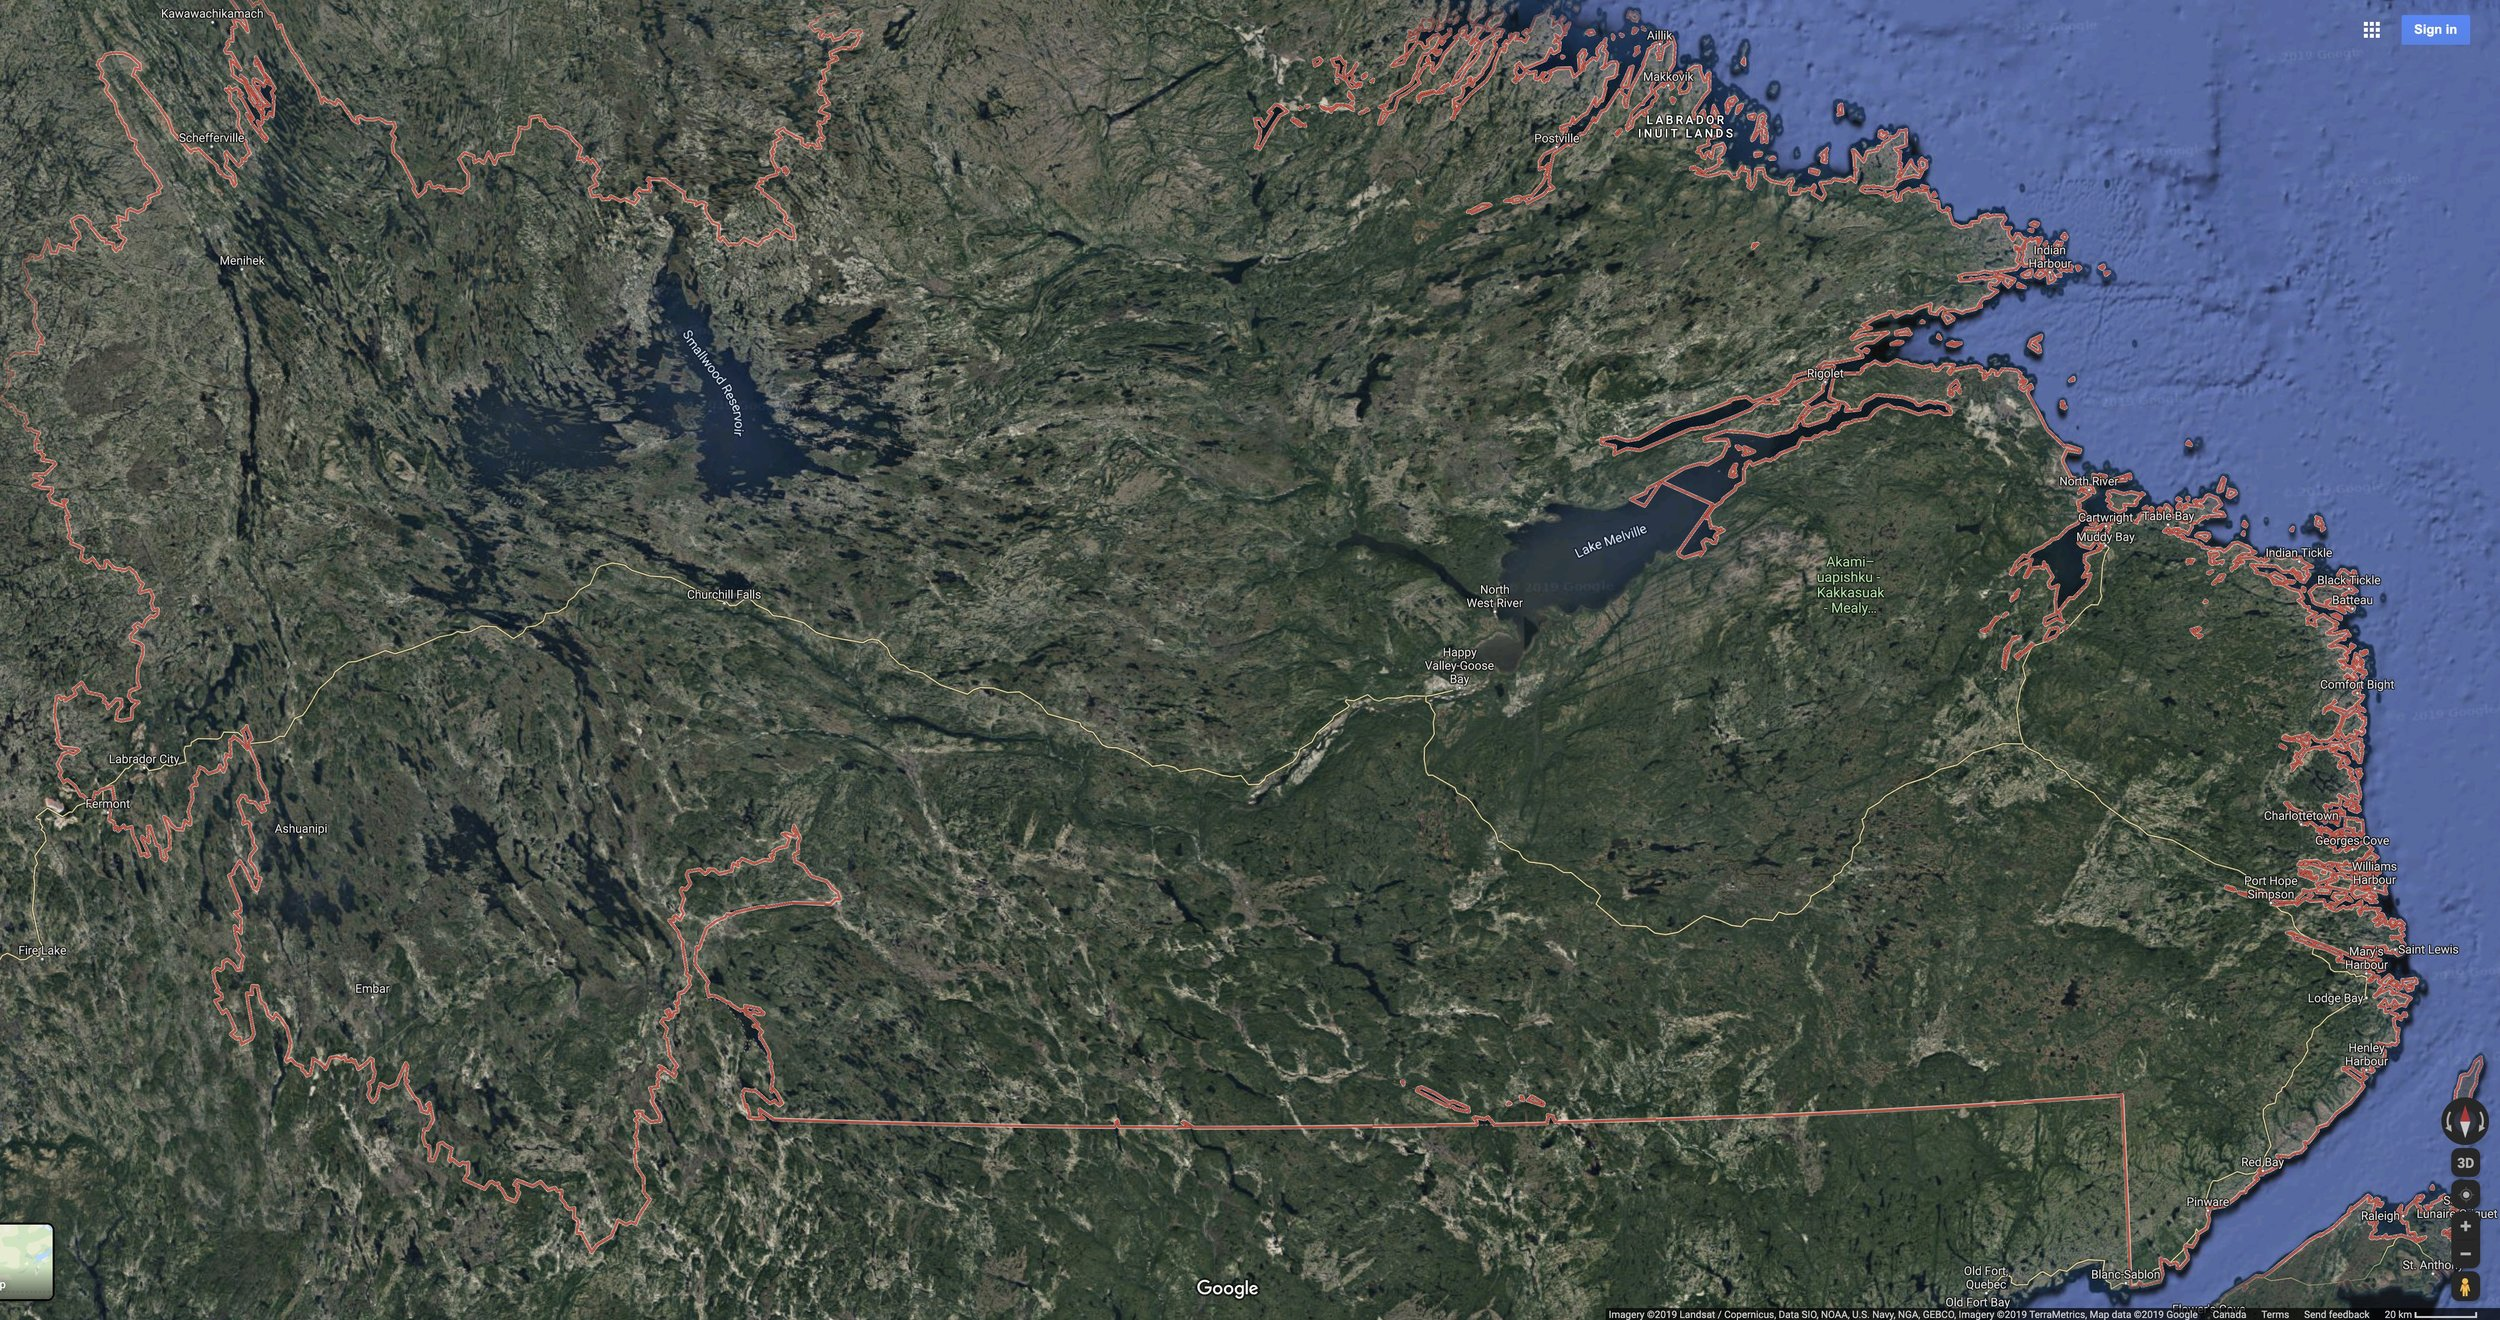 Satellite image of southern Labrador